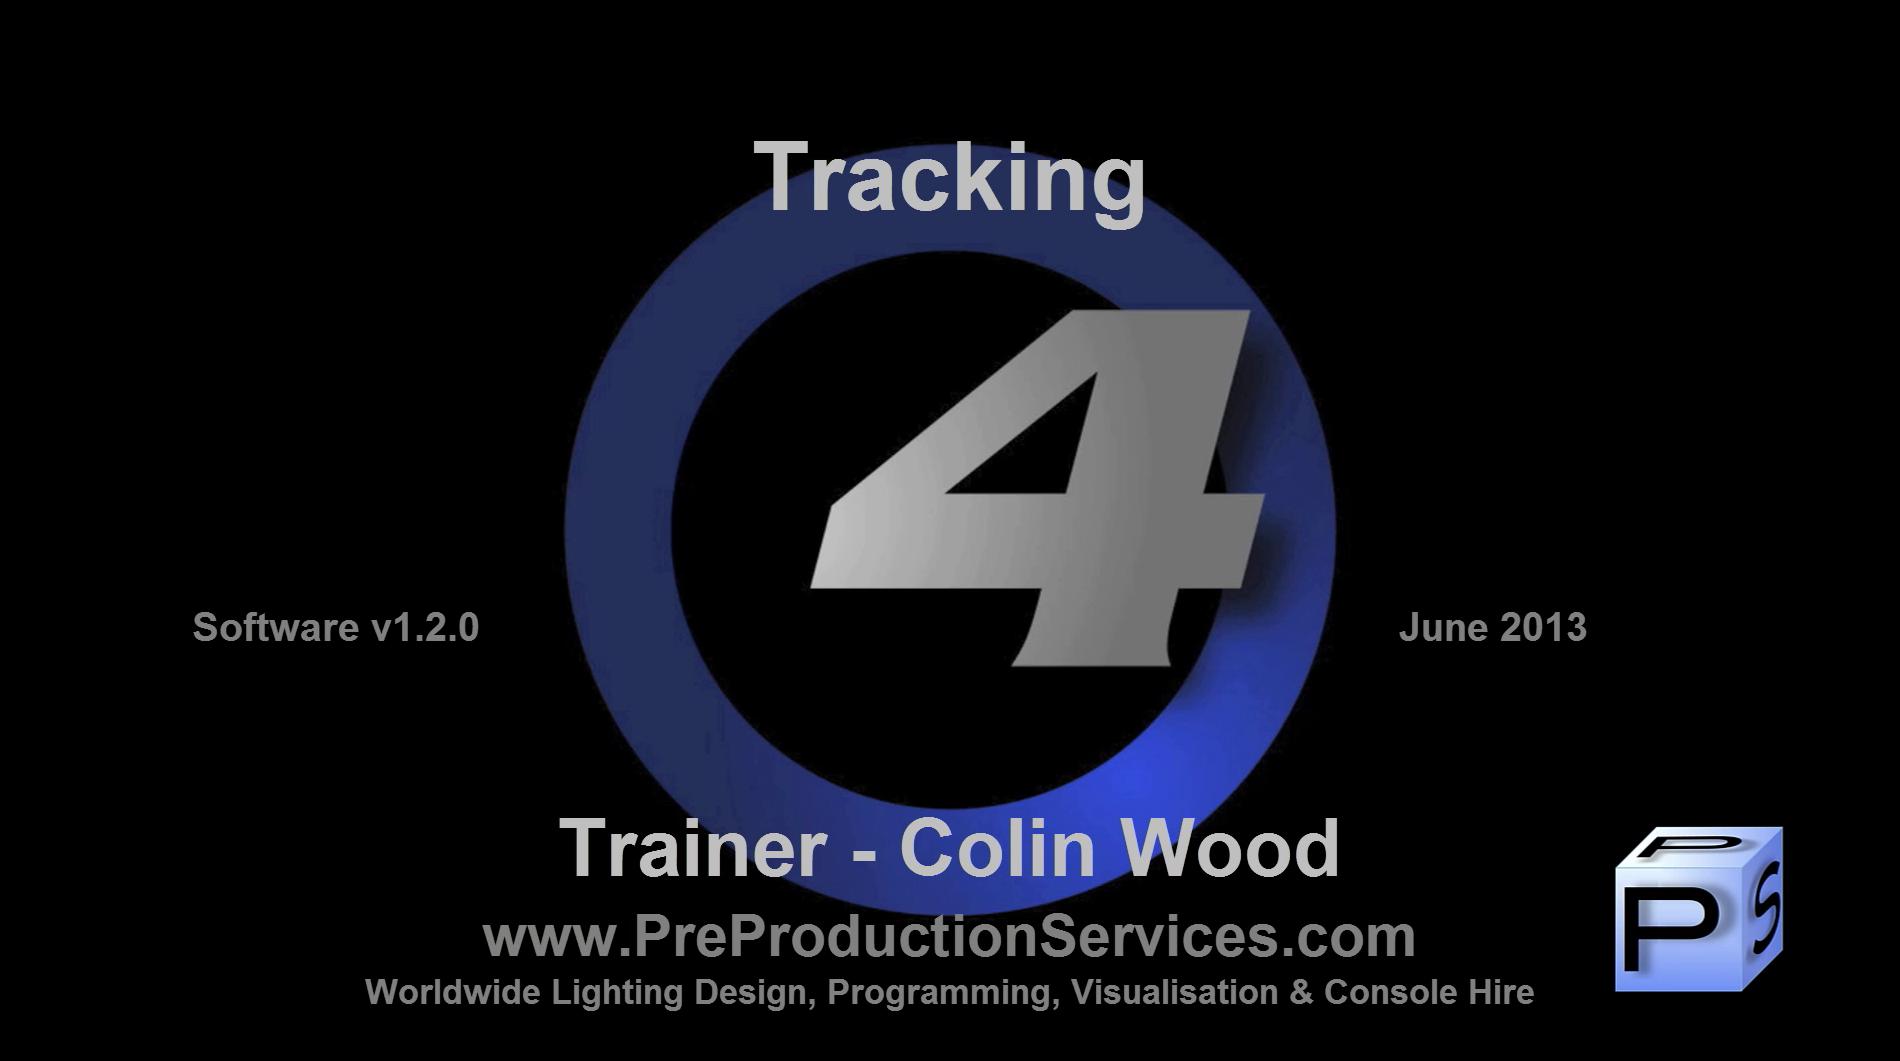 Colin Wood Hello Dolly Thumbnail.JPG